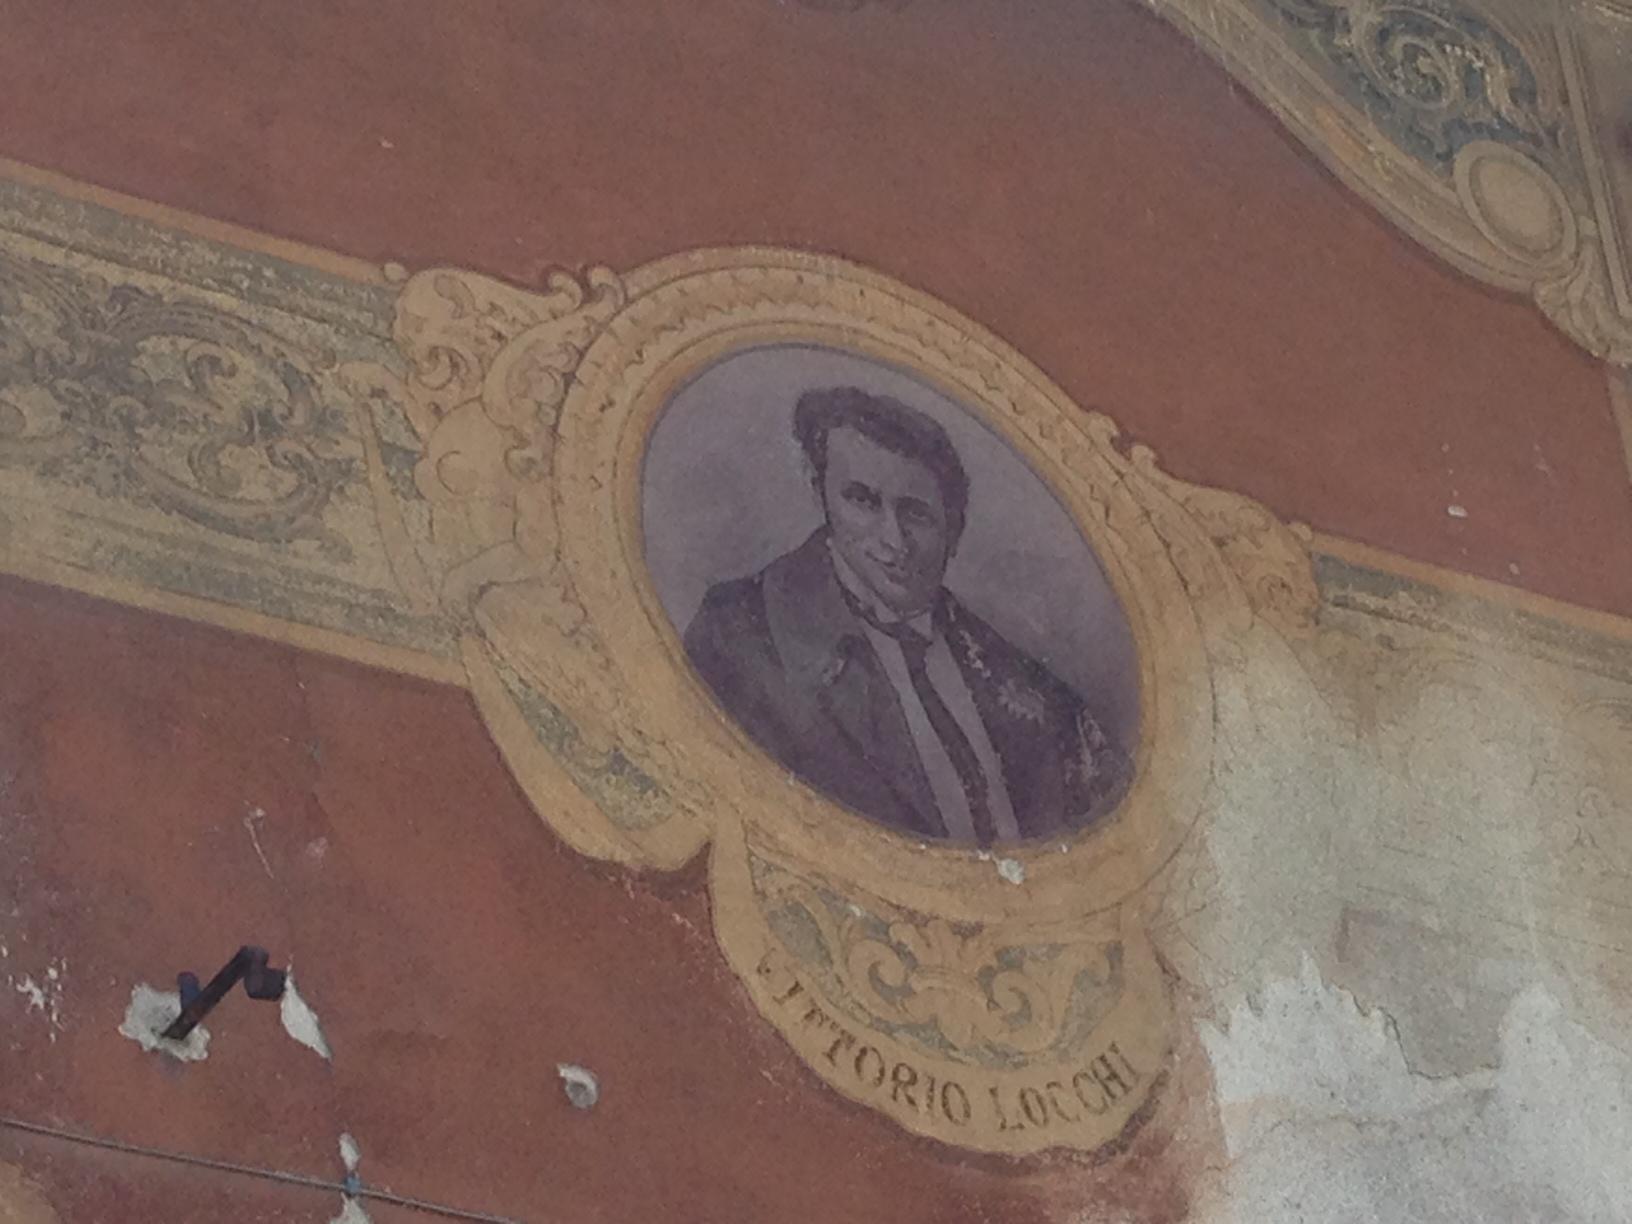 Vittorio_Locchi_Toscana_Novecento